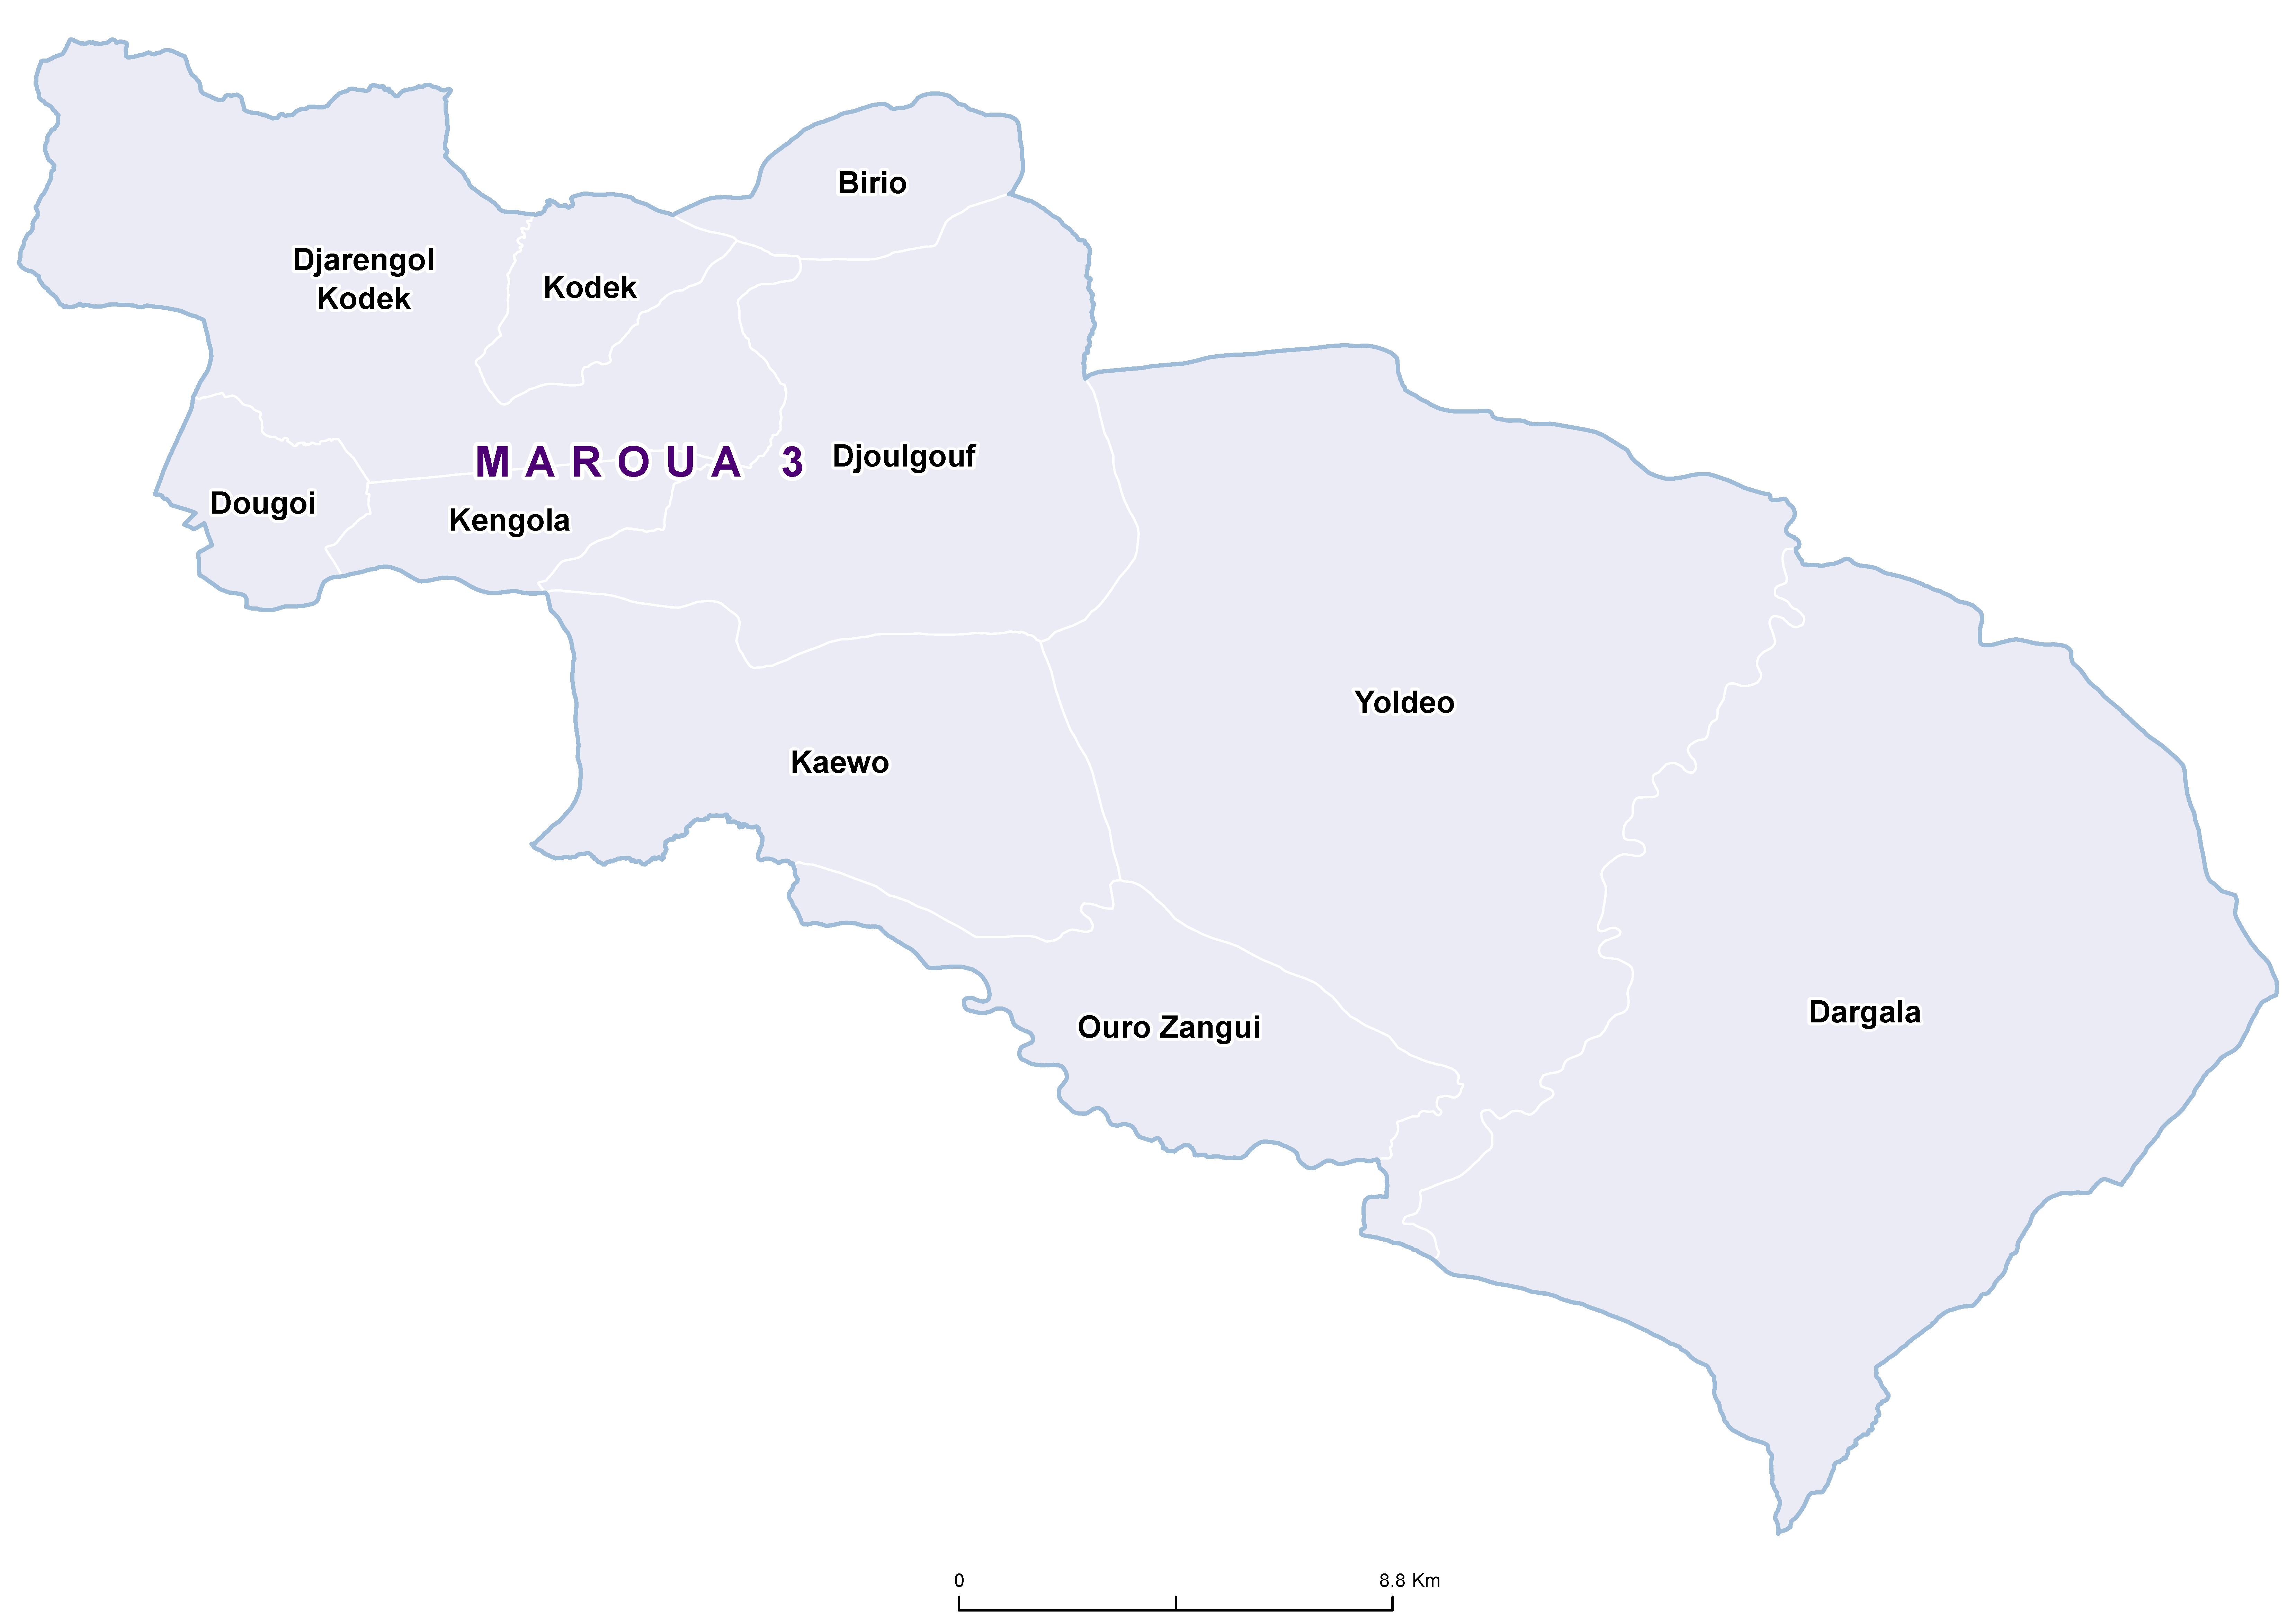 Maroua 3 SCH 20180001